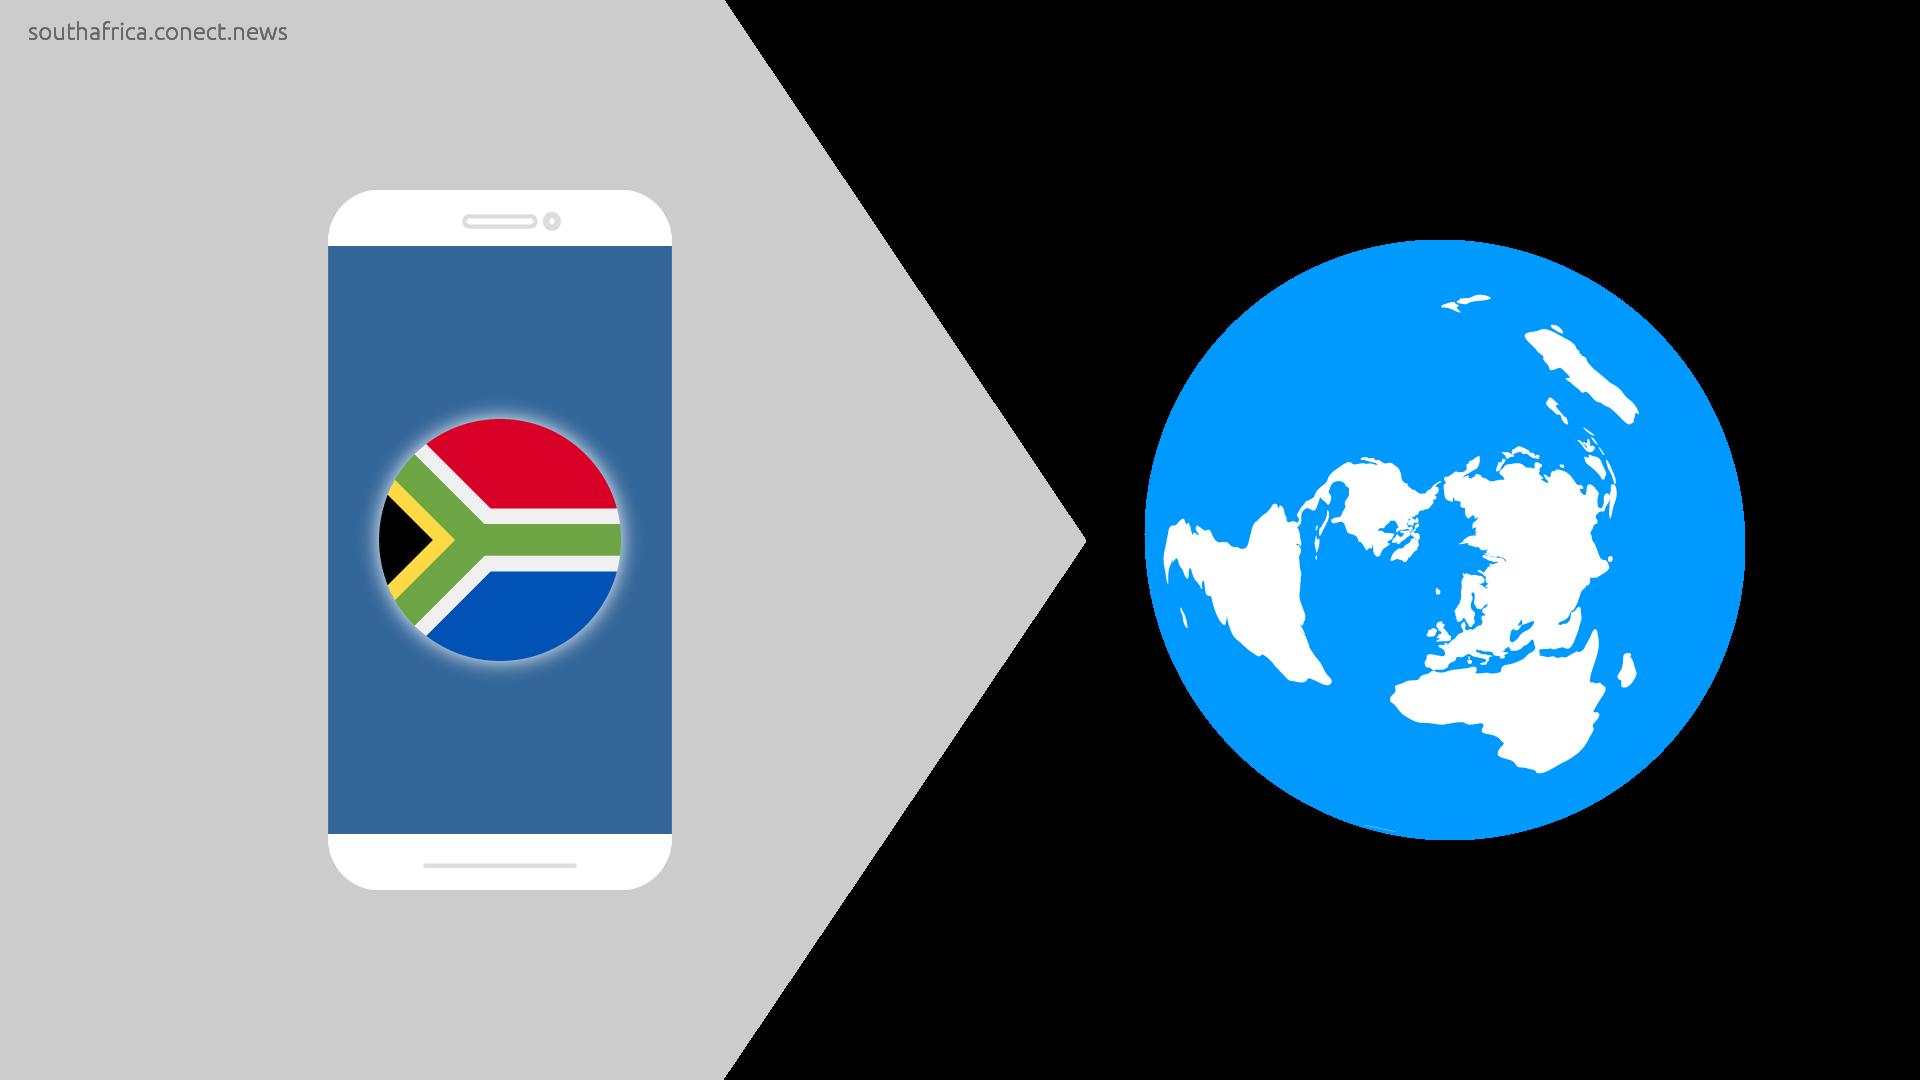 Südafrika-international@conect_news